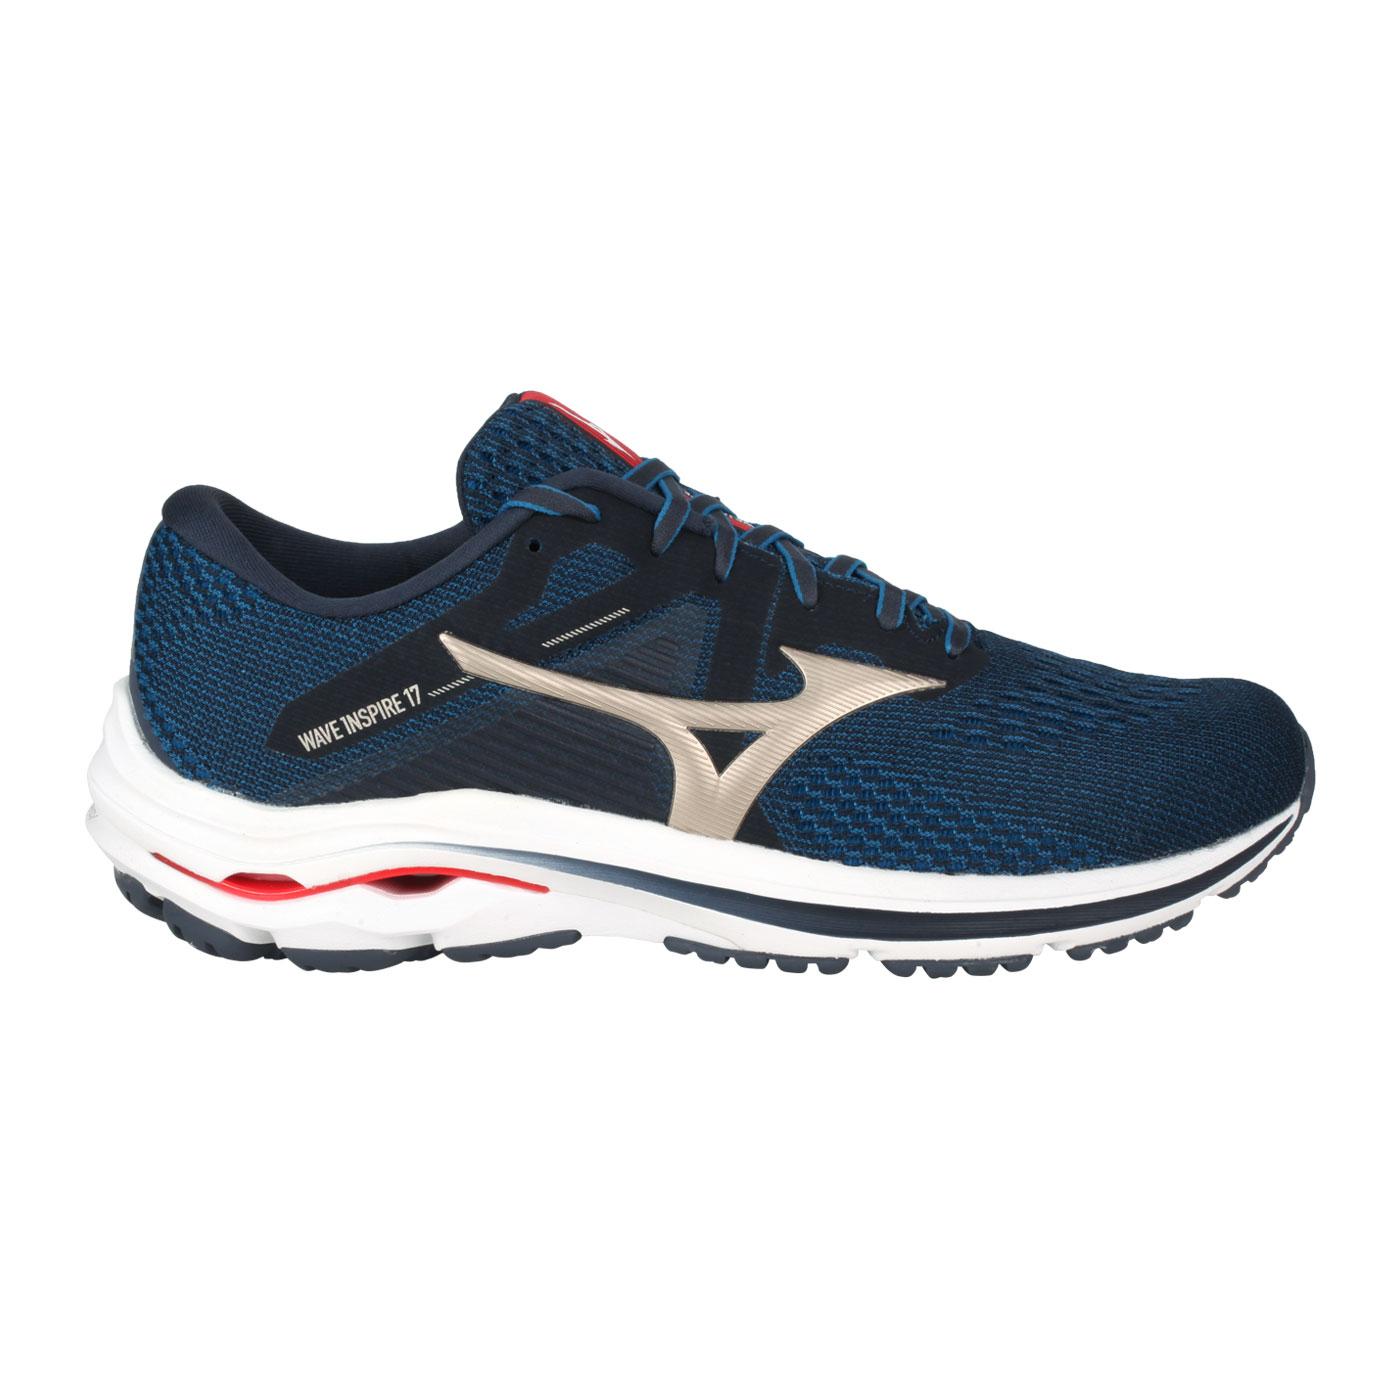 MIZUNO 男慢跑鞋-4E  @WAVE INSPIRE 17 SW@J1GC214542 - 藍香檳金